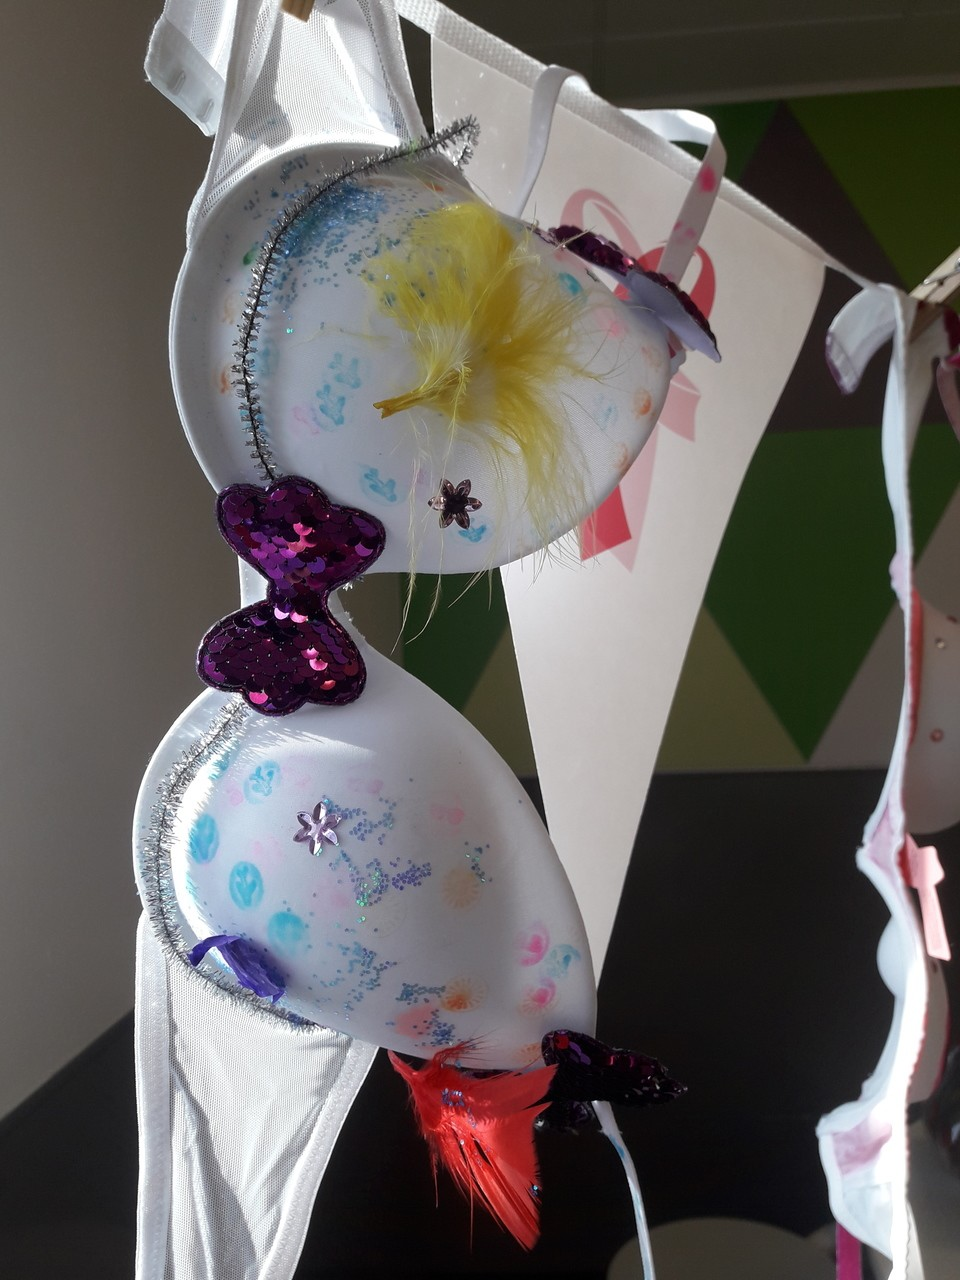 Tickled Pink fun | Asda Bournemouth